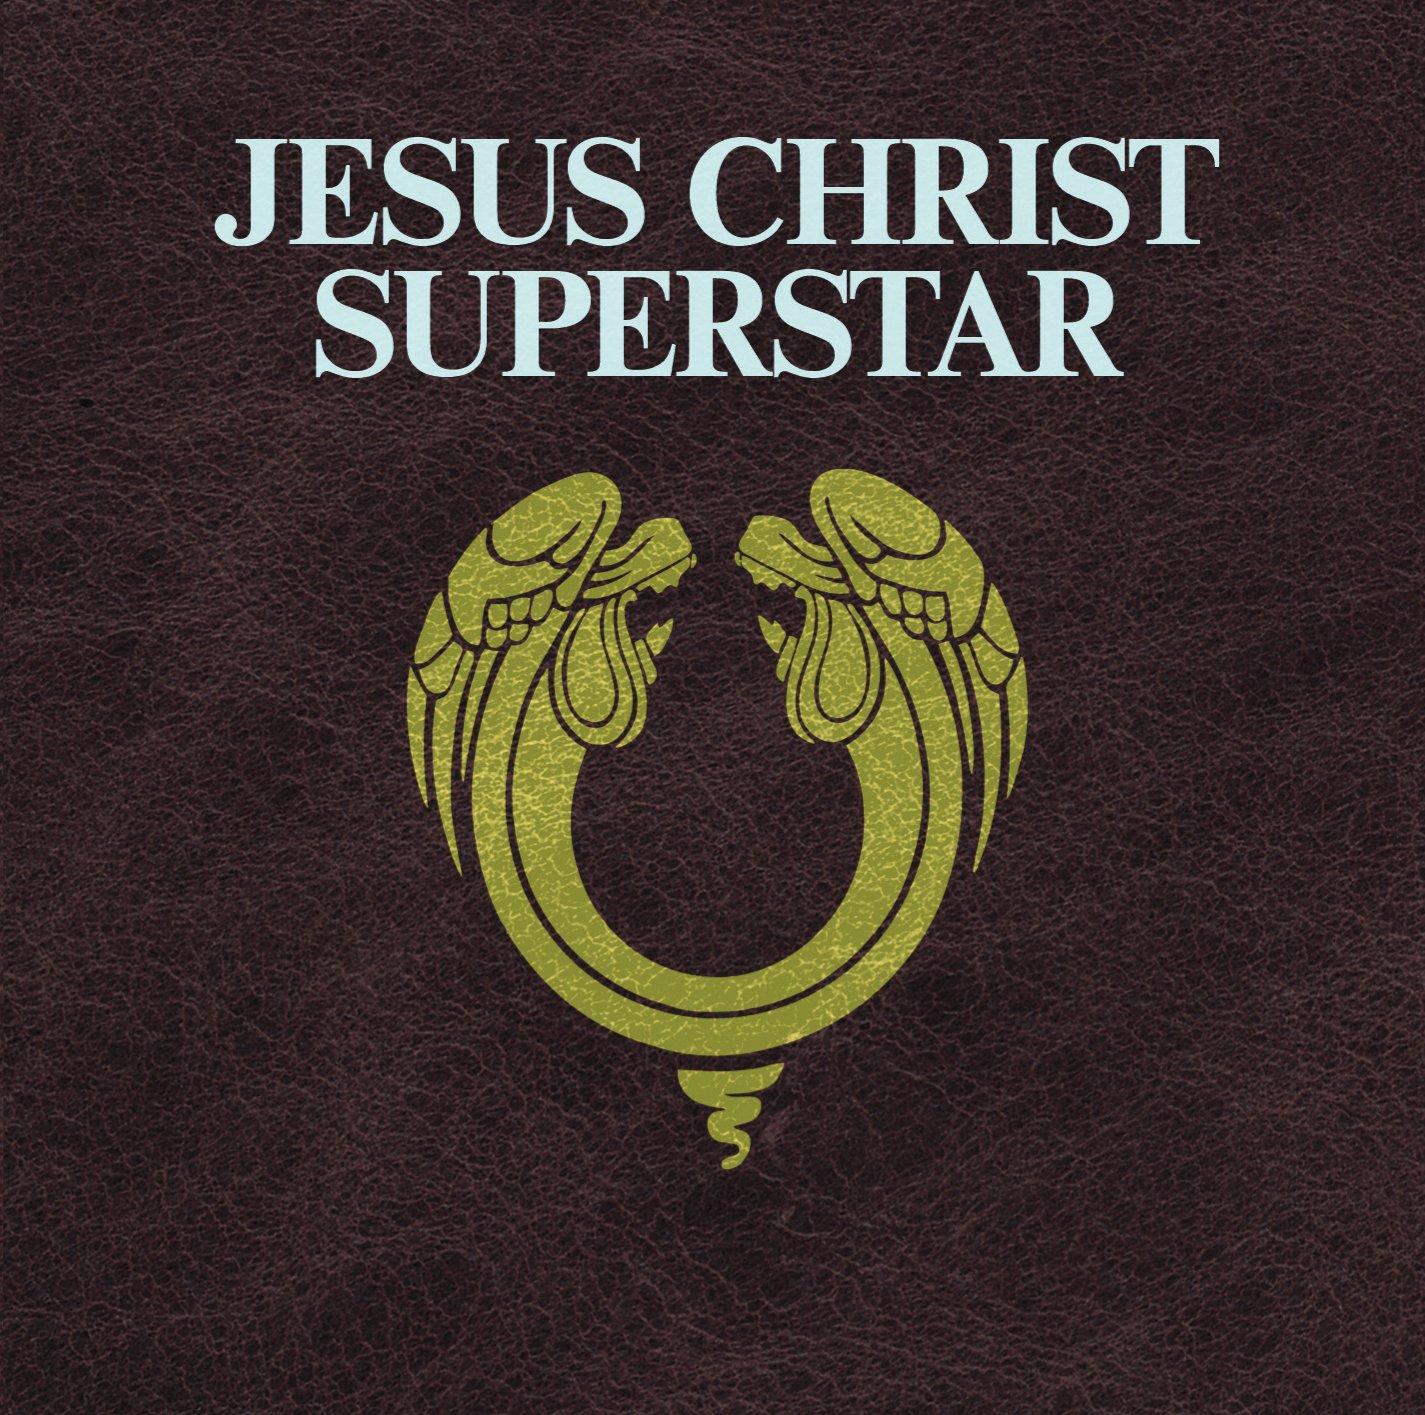 Jesus Christ Superstar (1973) | LyricWiki - lyrics.fandom.com